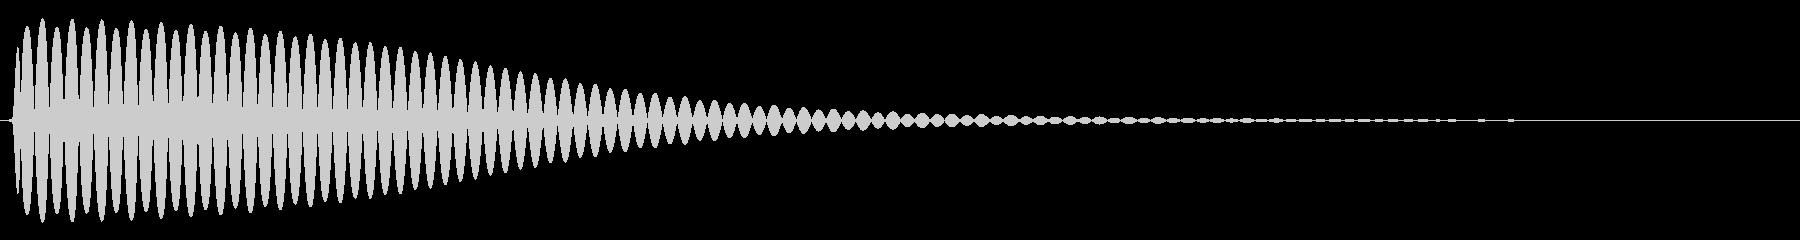 Com ファミコンなどのコマンド音 3の未再生の波形